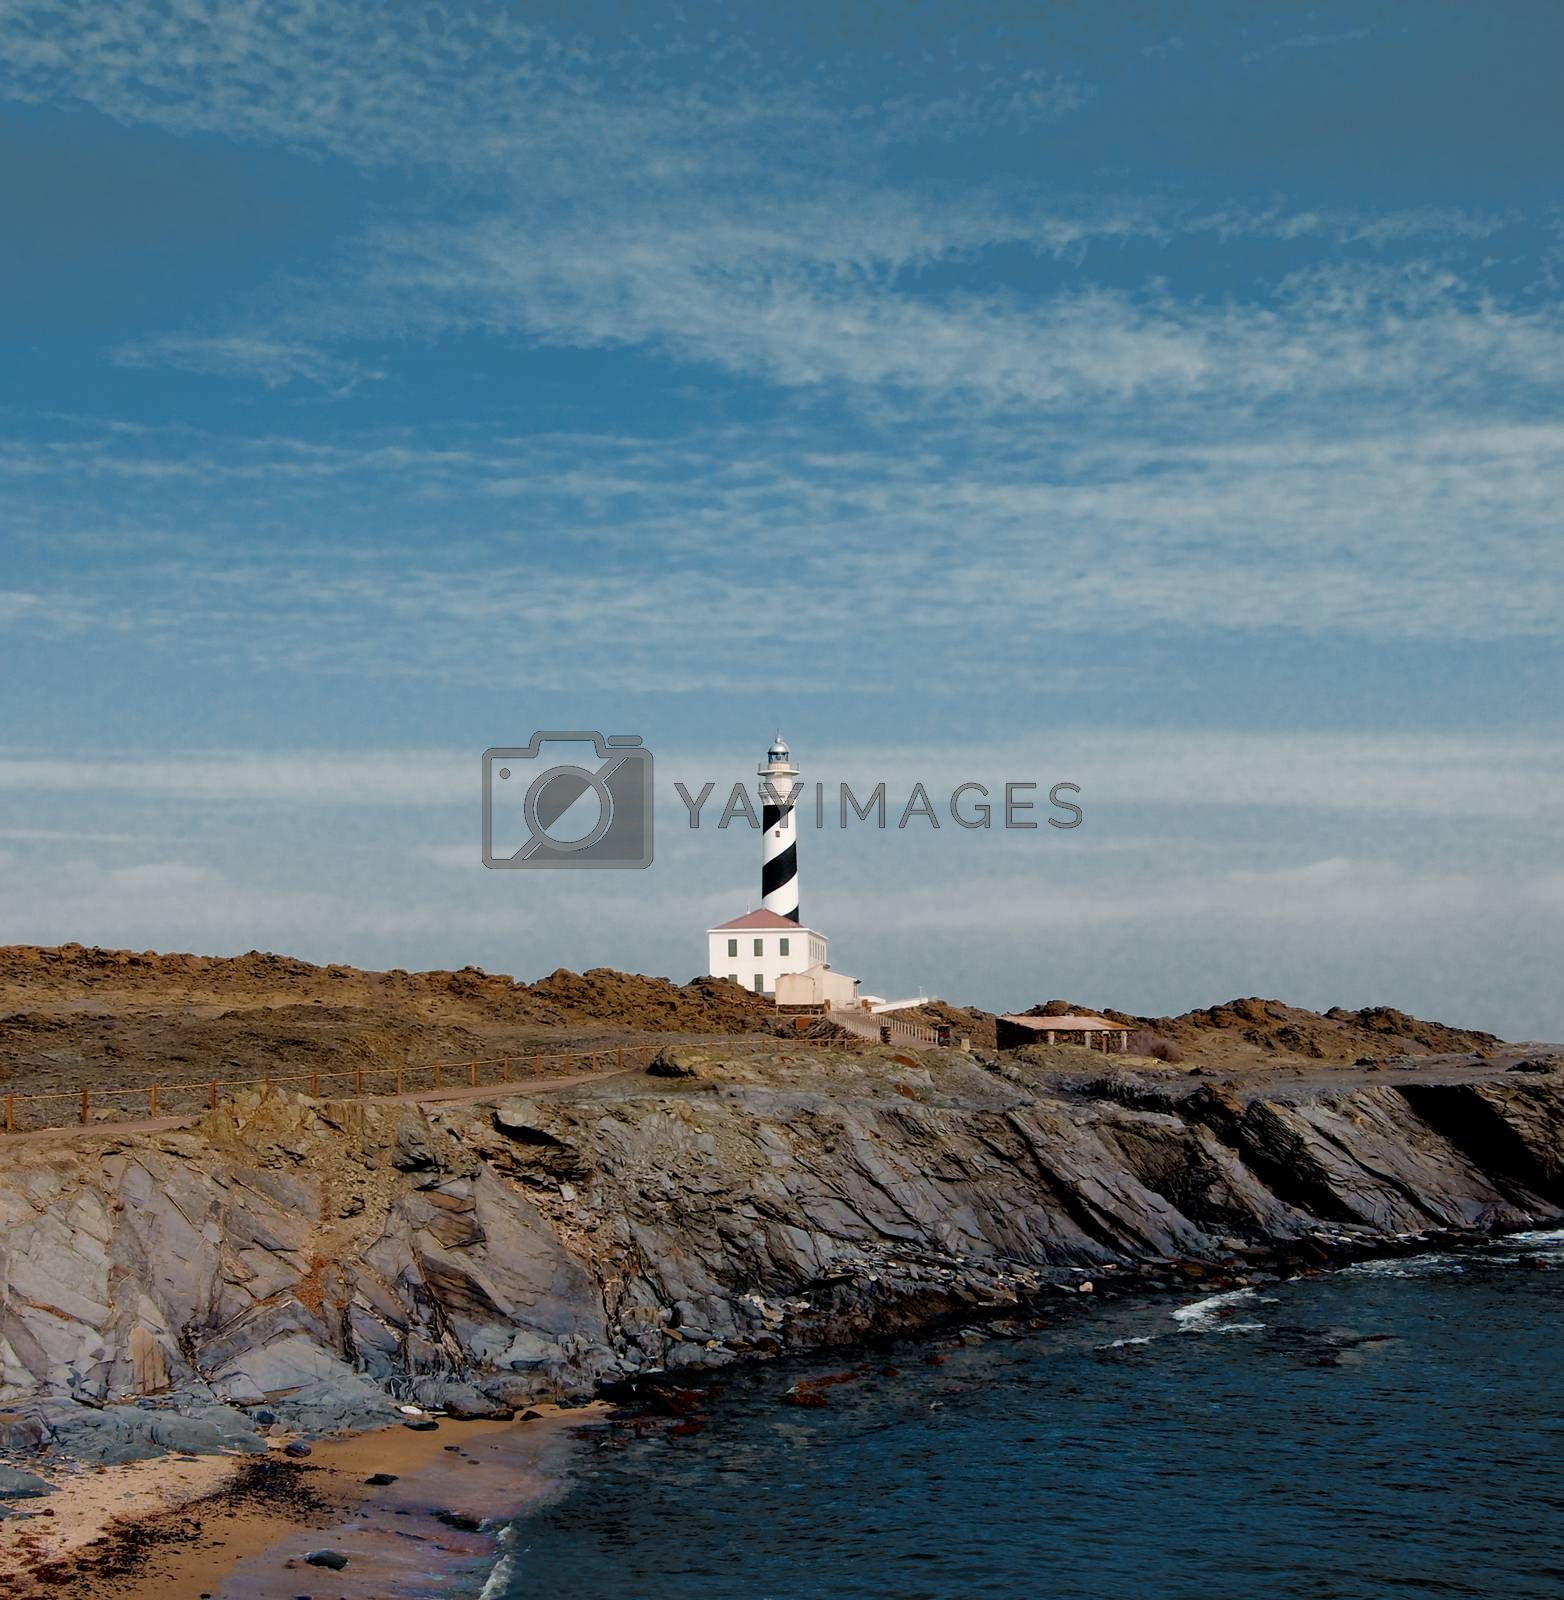 Lighthouse Faro de Favaritx against Dramatic Sky background. Menorca, Balearic Islands.